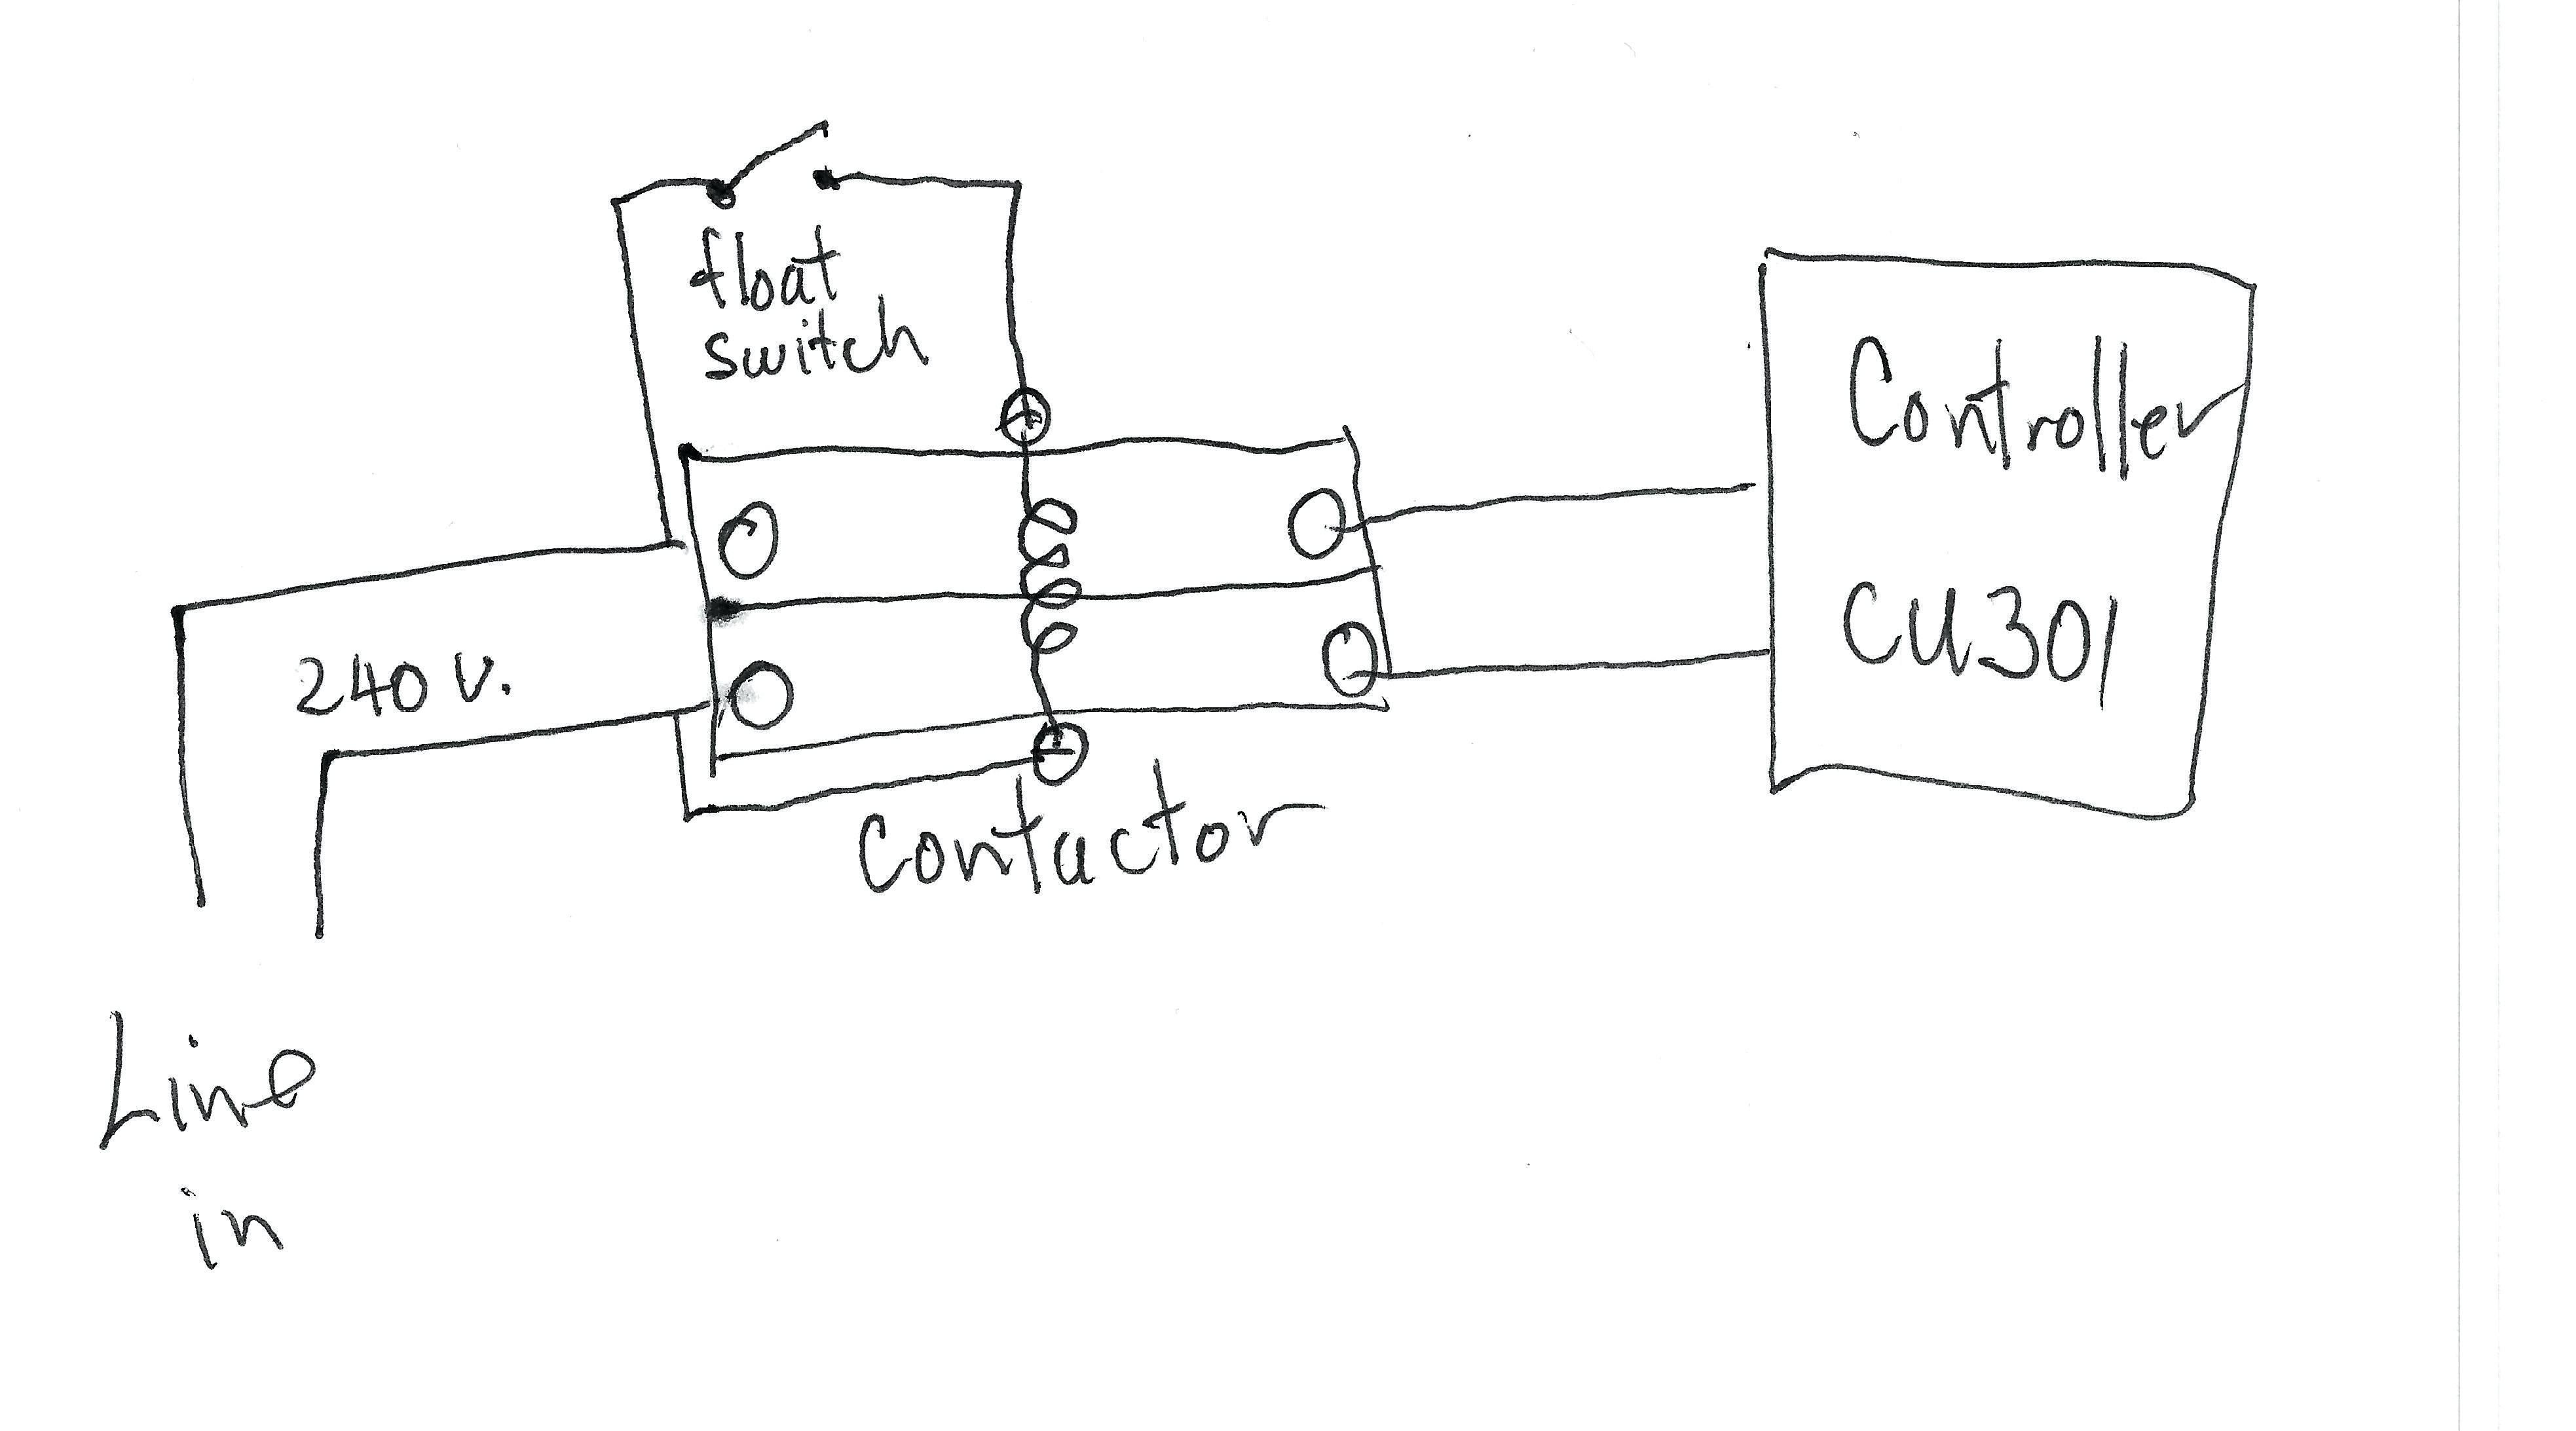 Well Pump Pressure Switch Wiring Diagram Square D Pumptrol Wiring Diagram Easy Rules Wiring Diagram • Of Well Pump Pressure Switch Wiring Diagram